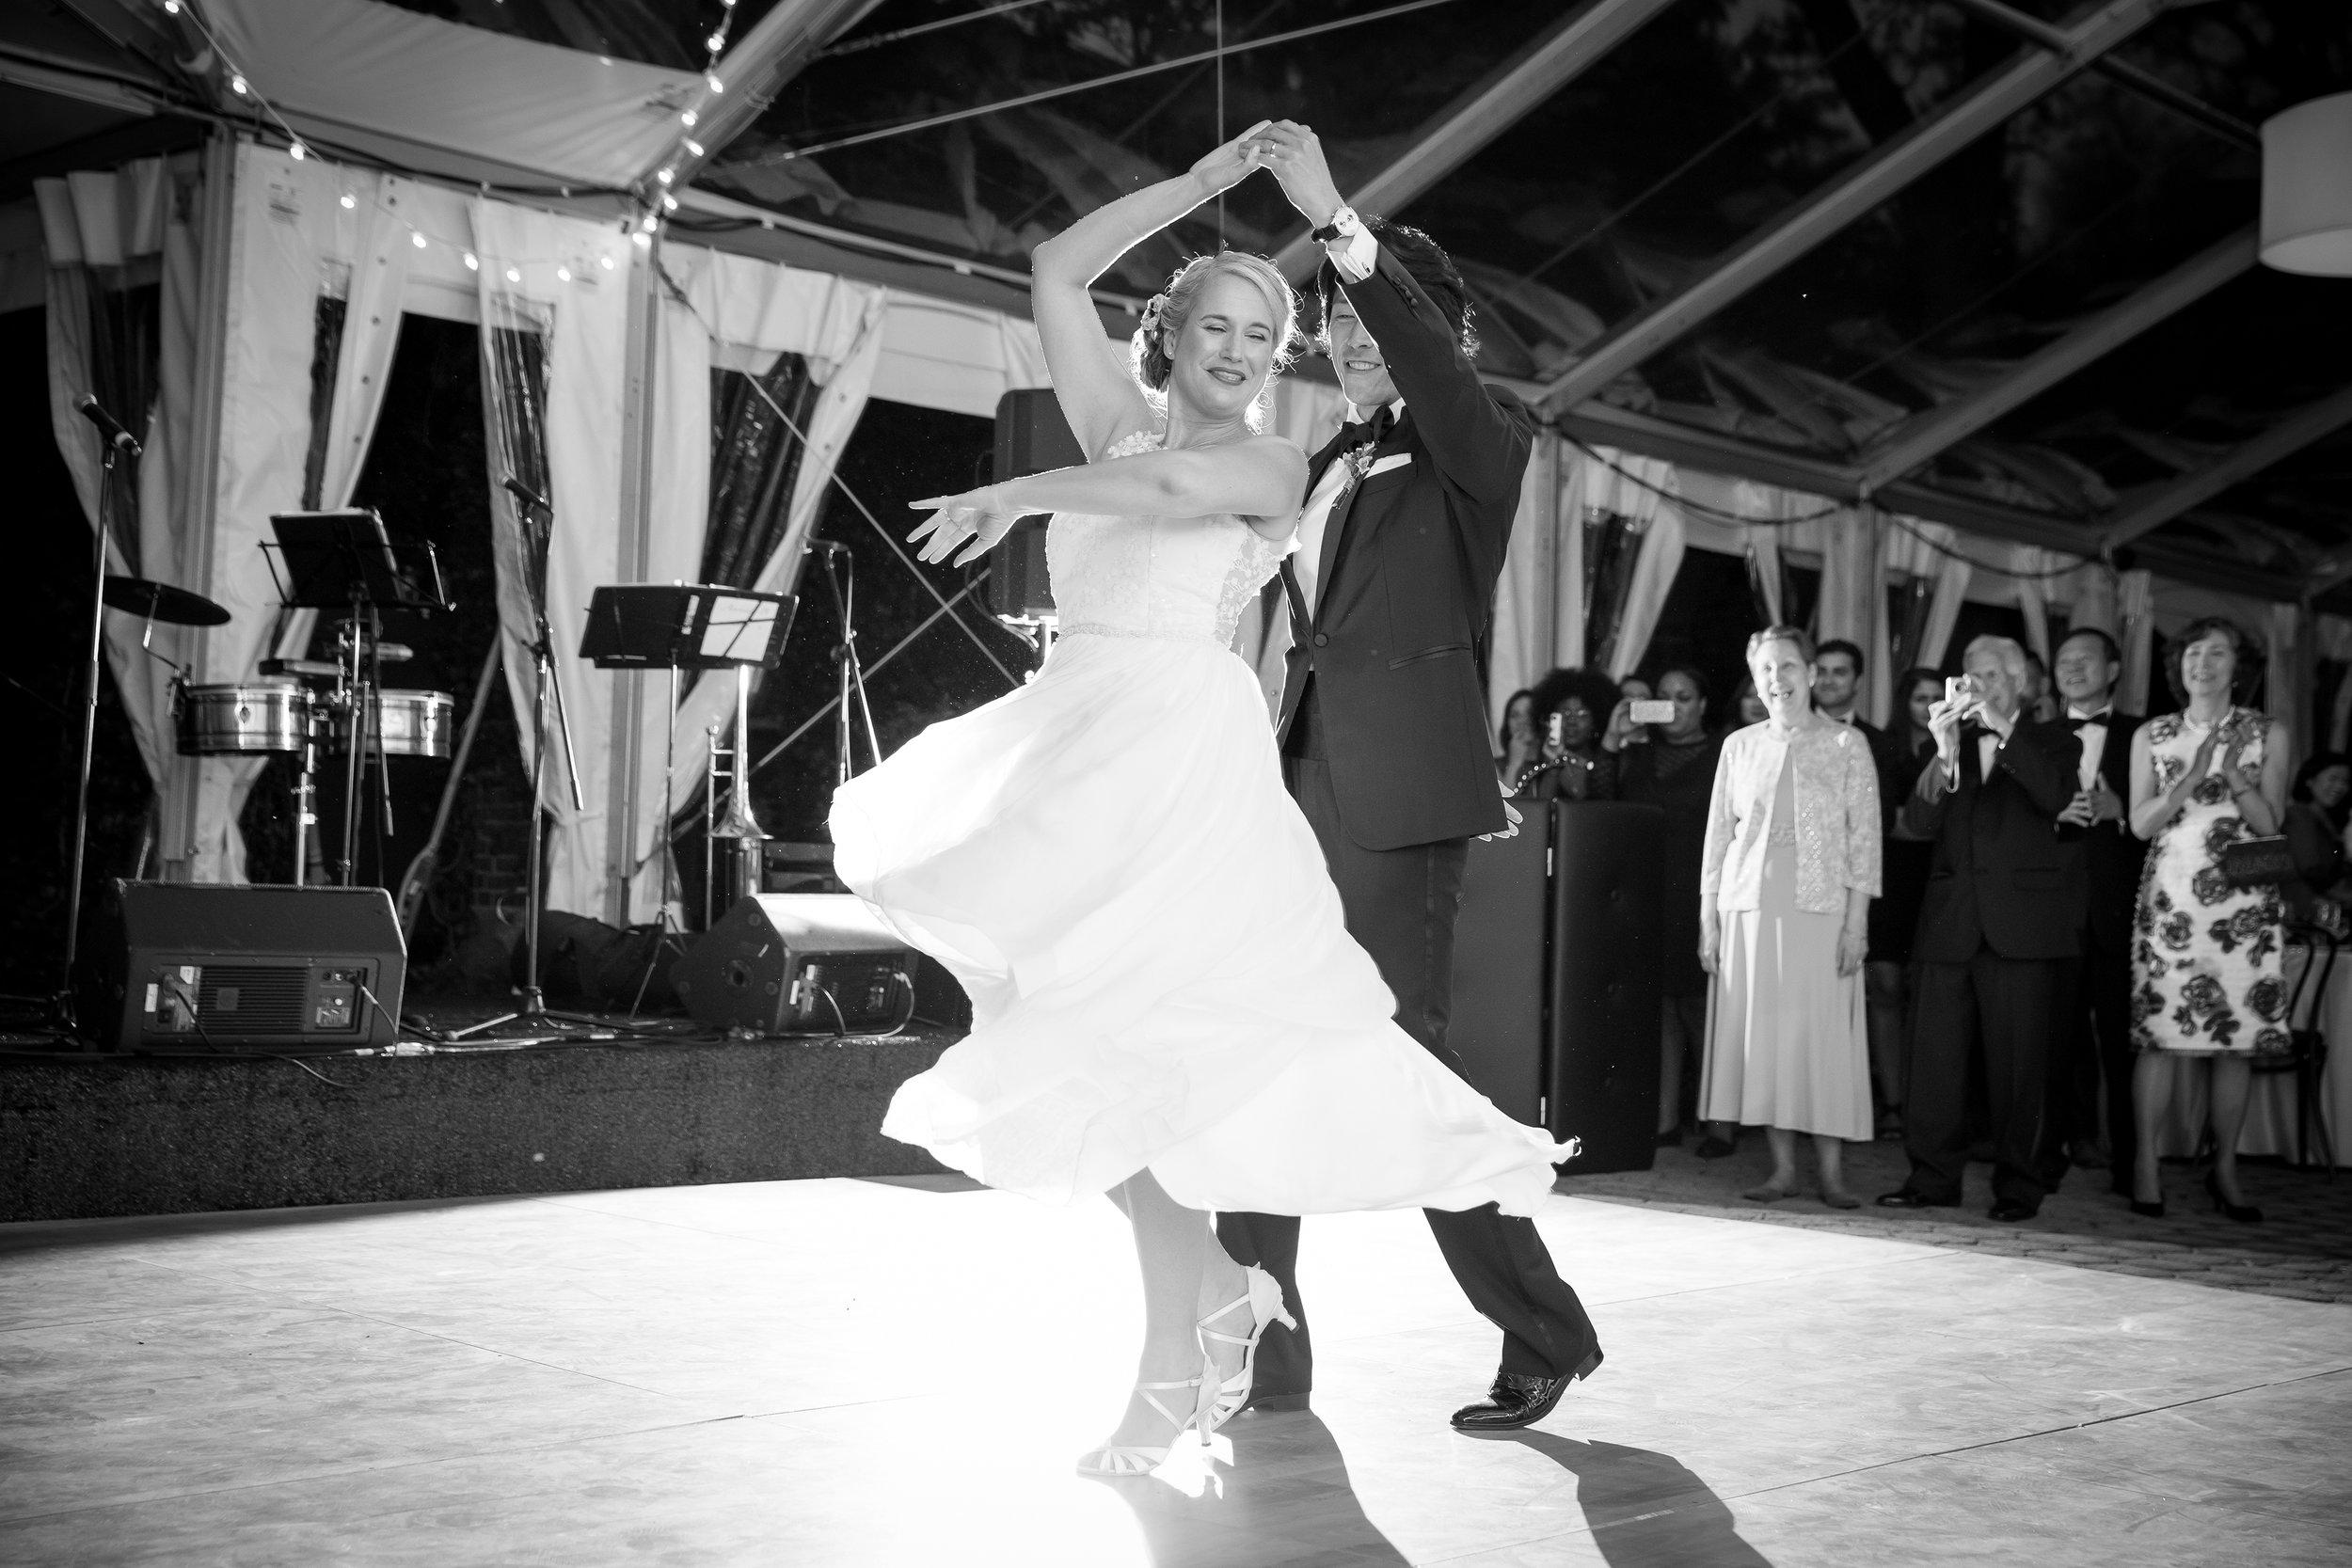 victorious-events-nyc-031-colleen-taka-central-park-zoo-wedding-raymond-hamlin.jpg